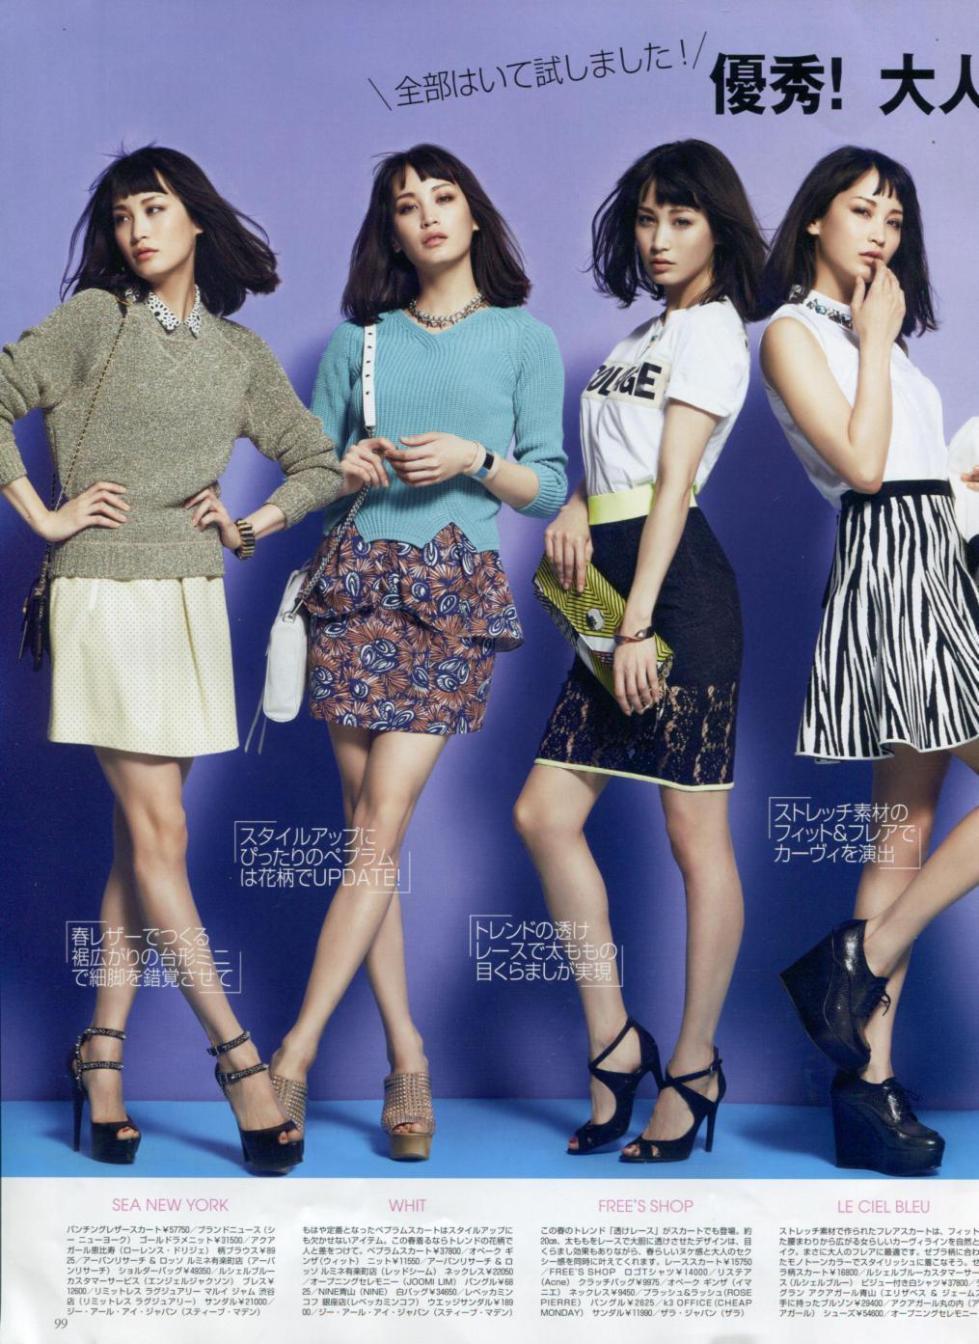 Glamorous JAP 2013-5-1 pag 99